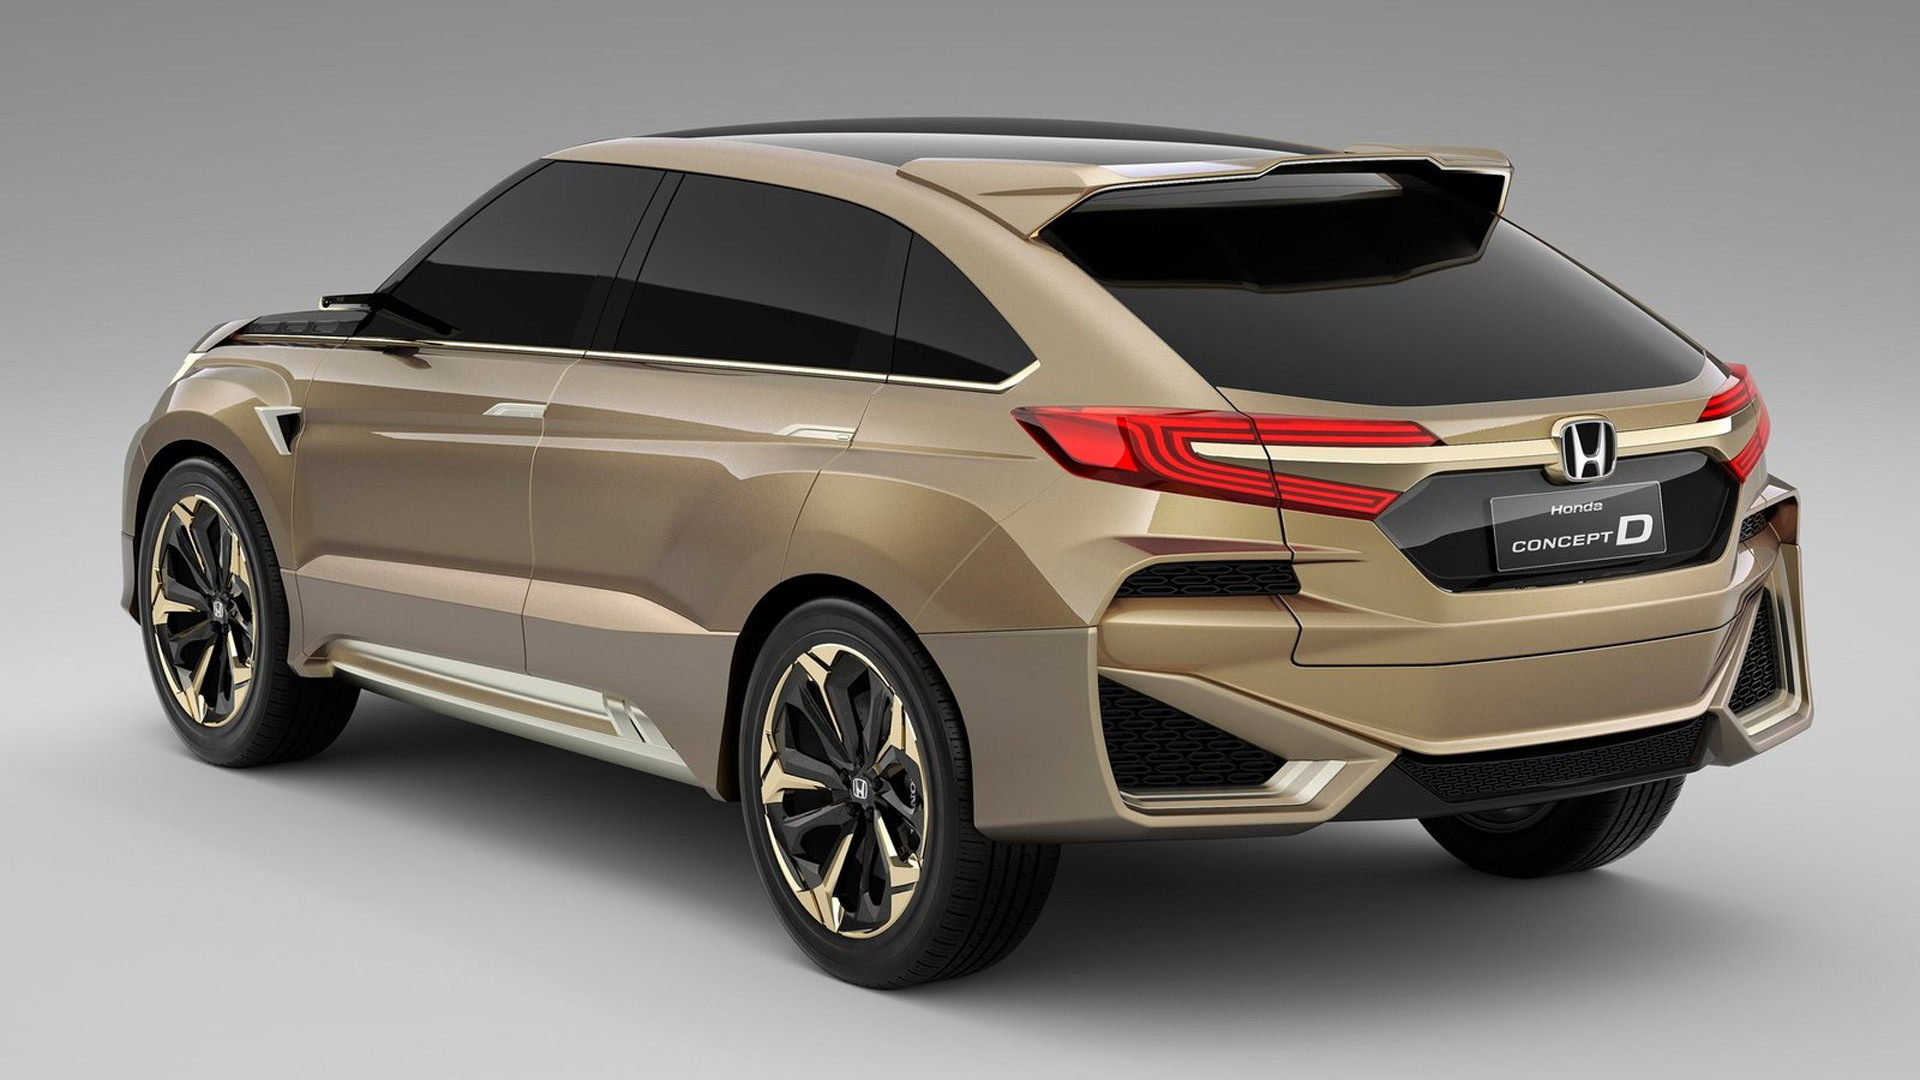 Honda Concept D, 2015 Shanghai Auto Show